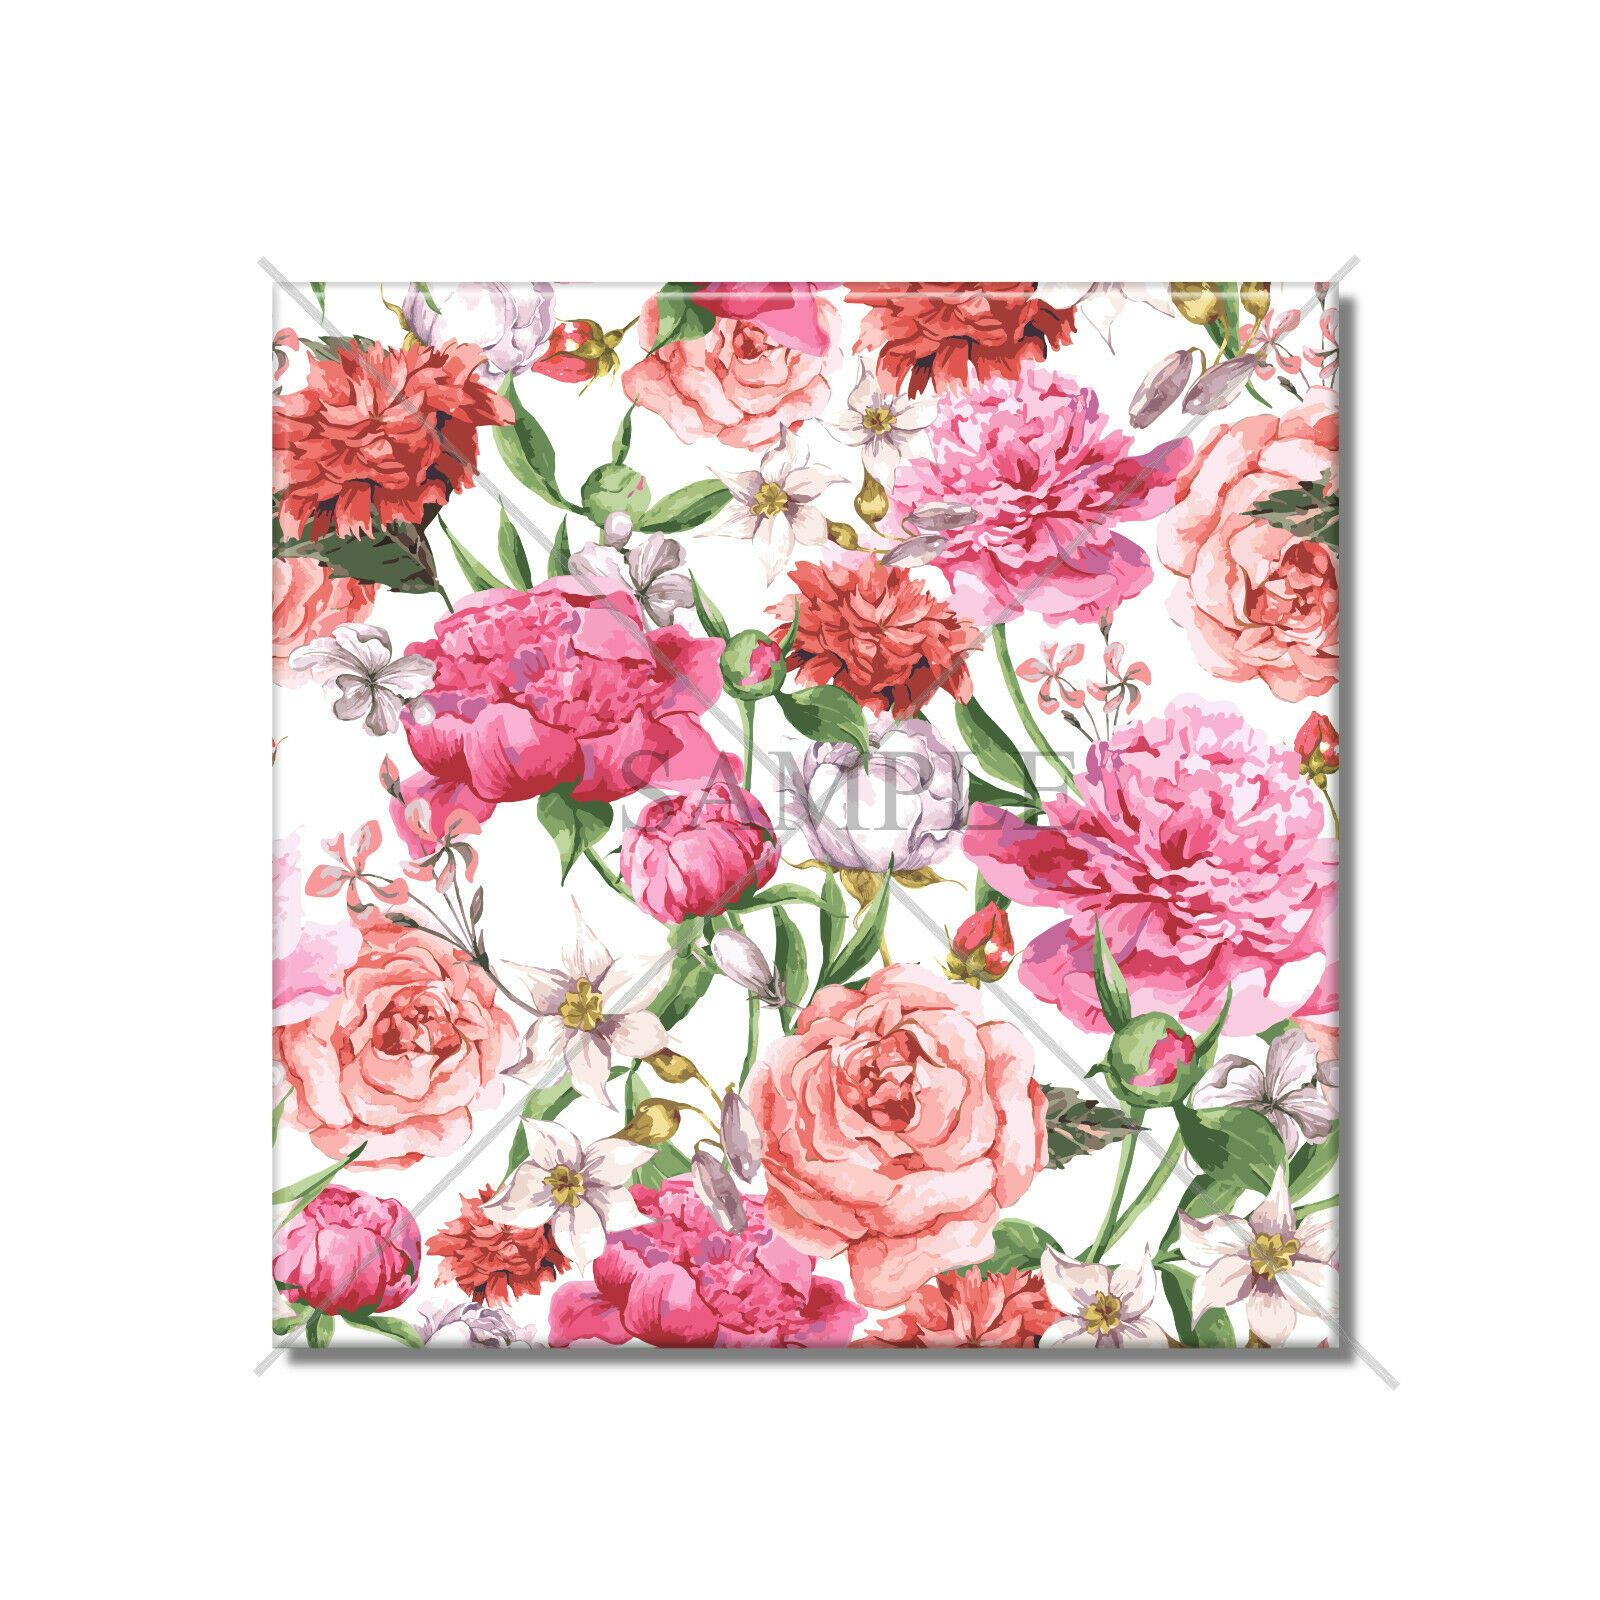 Ceramic Tile Decorative Floral Design Creamic Wall Tile